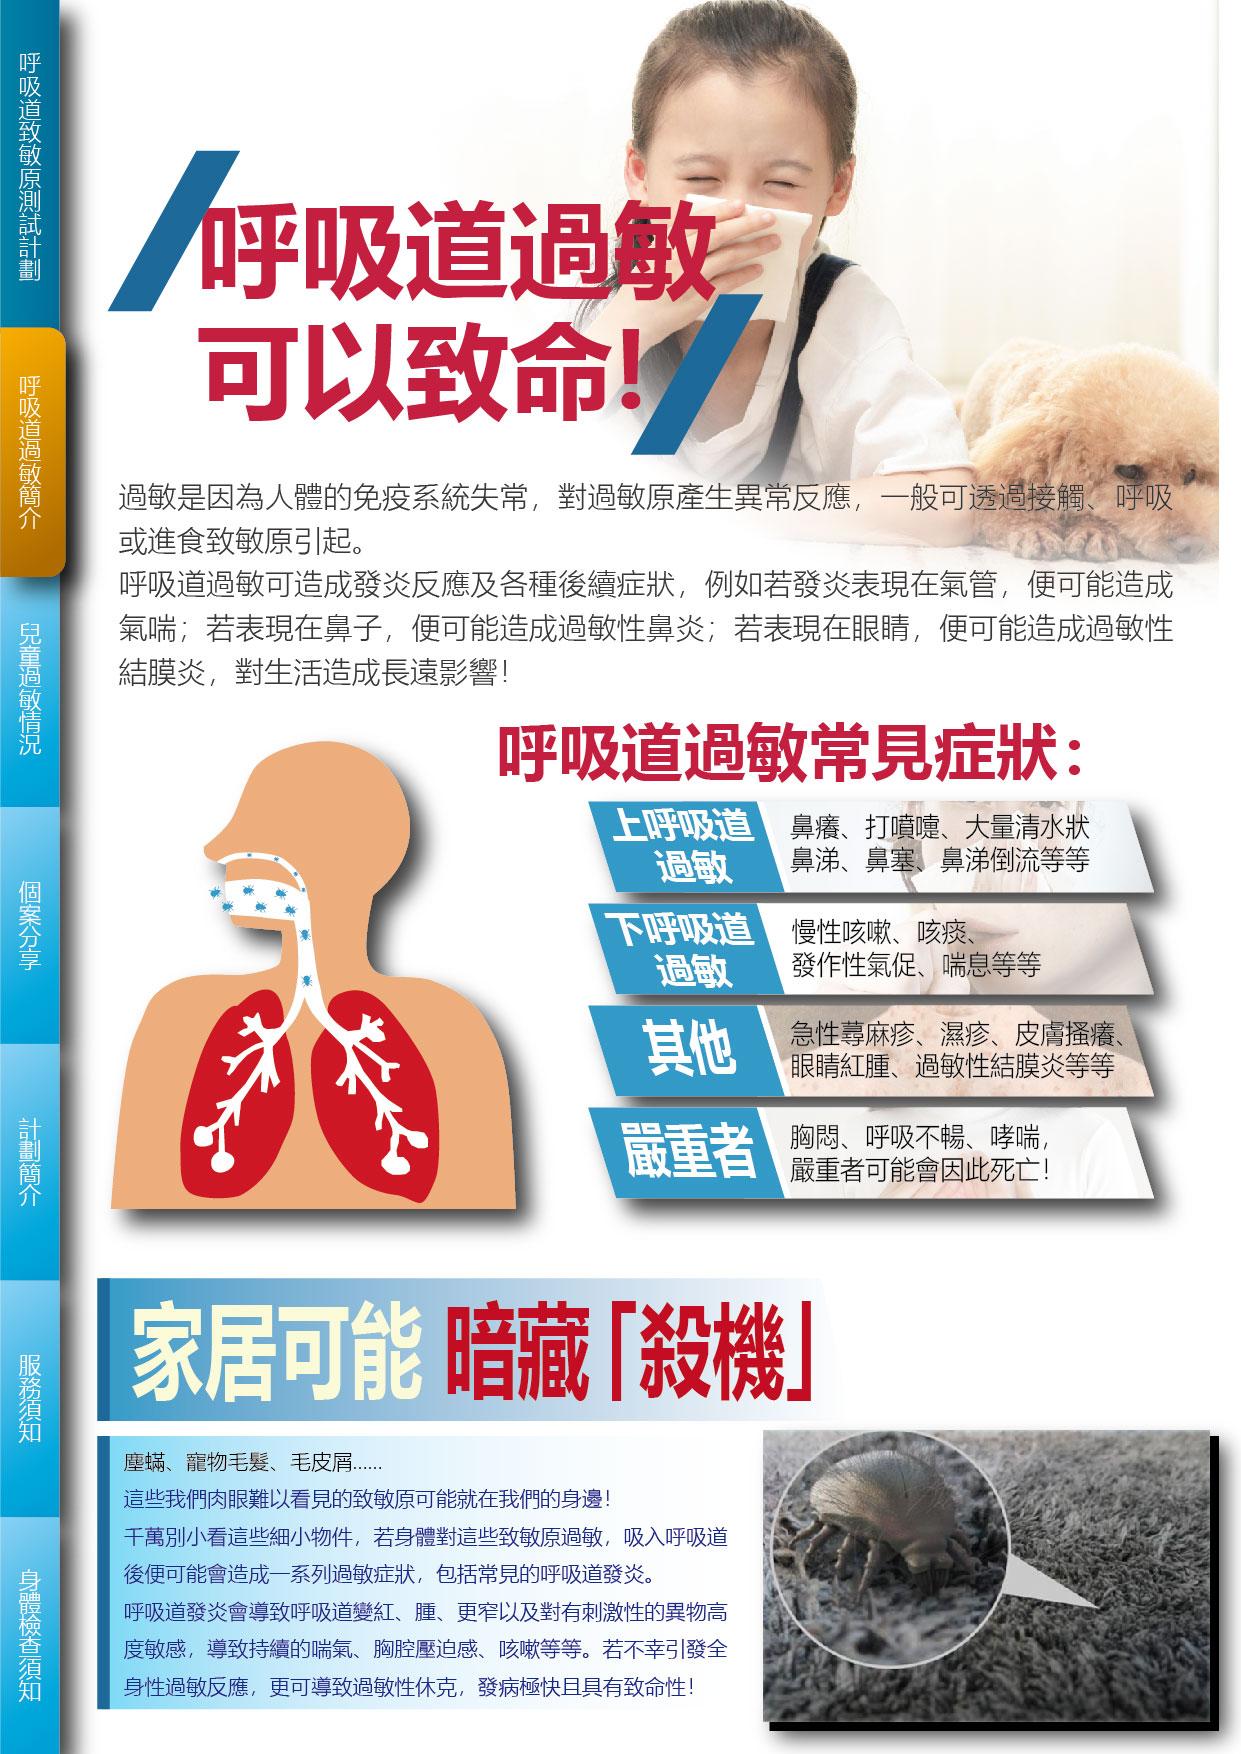 -rtss21mm-respiratory-allergy-ige-test-2.jpg